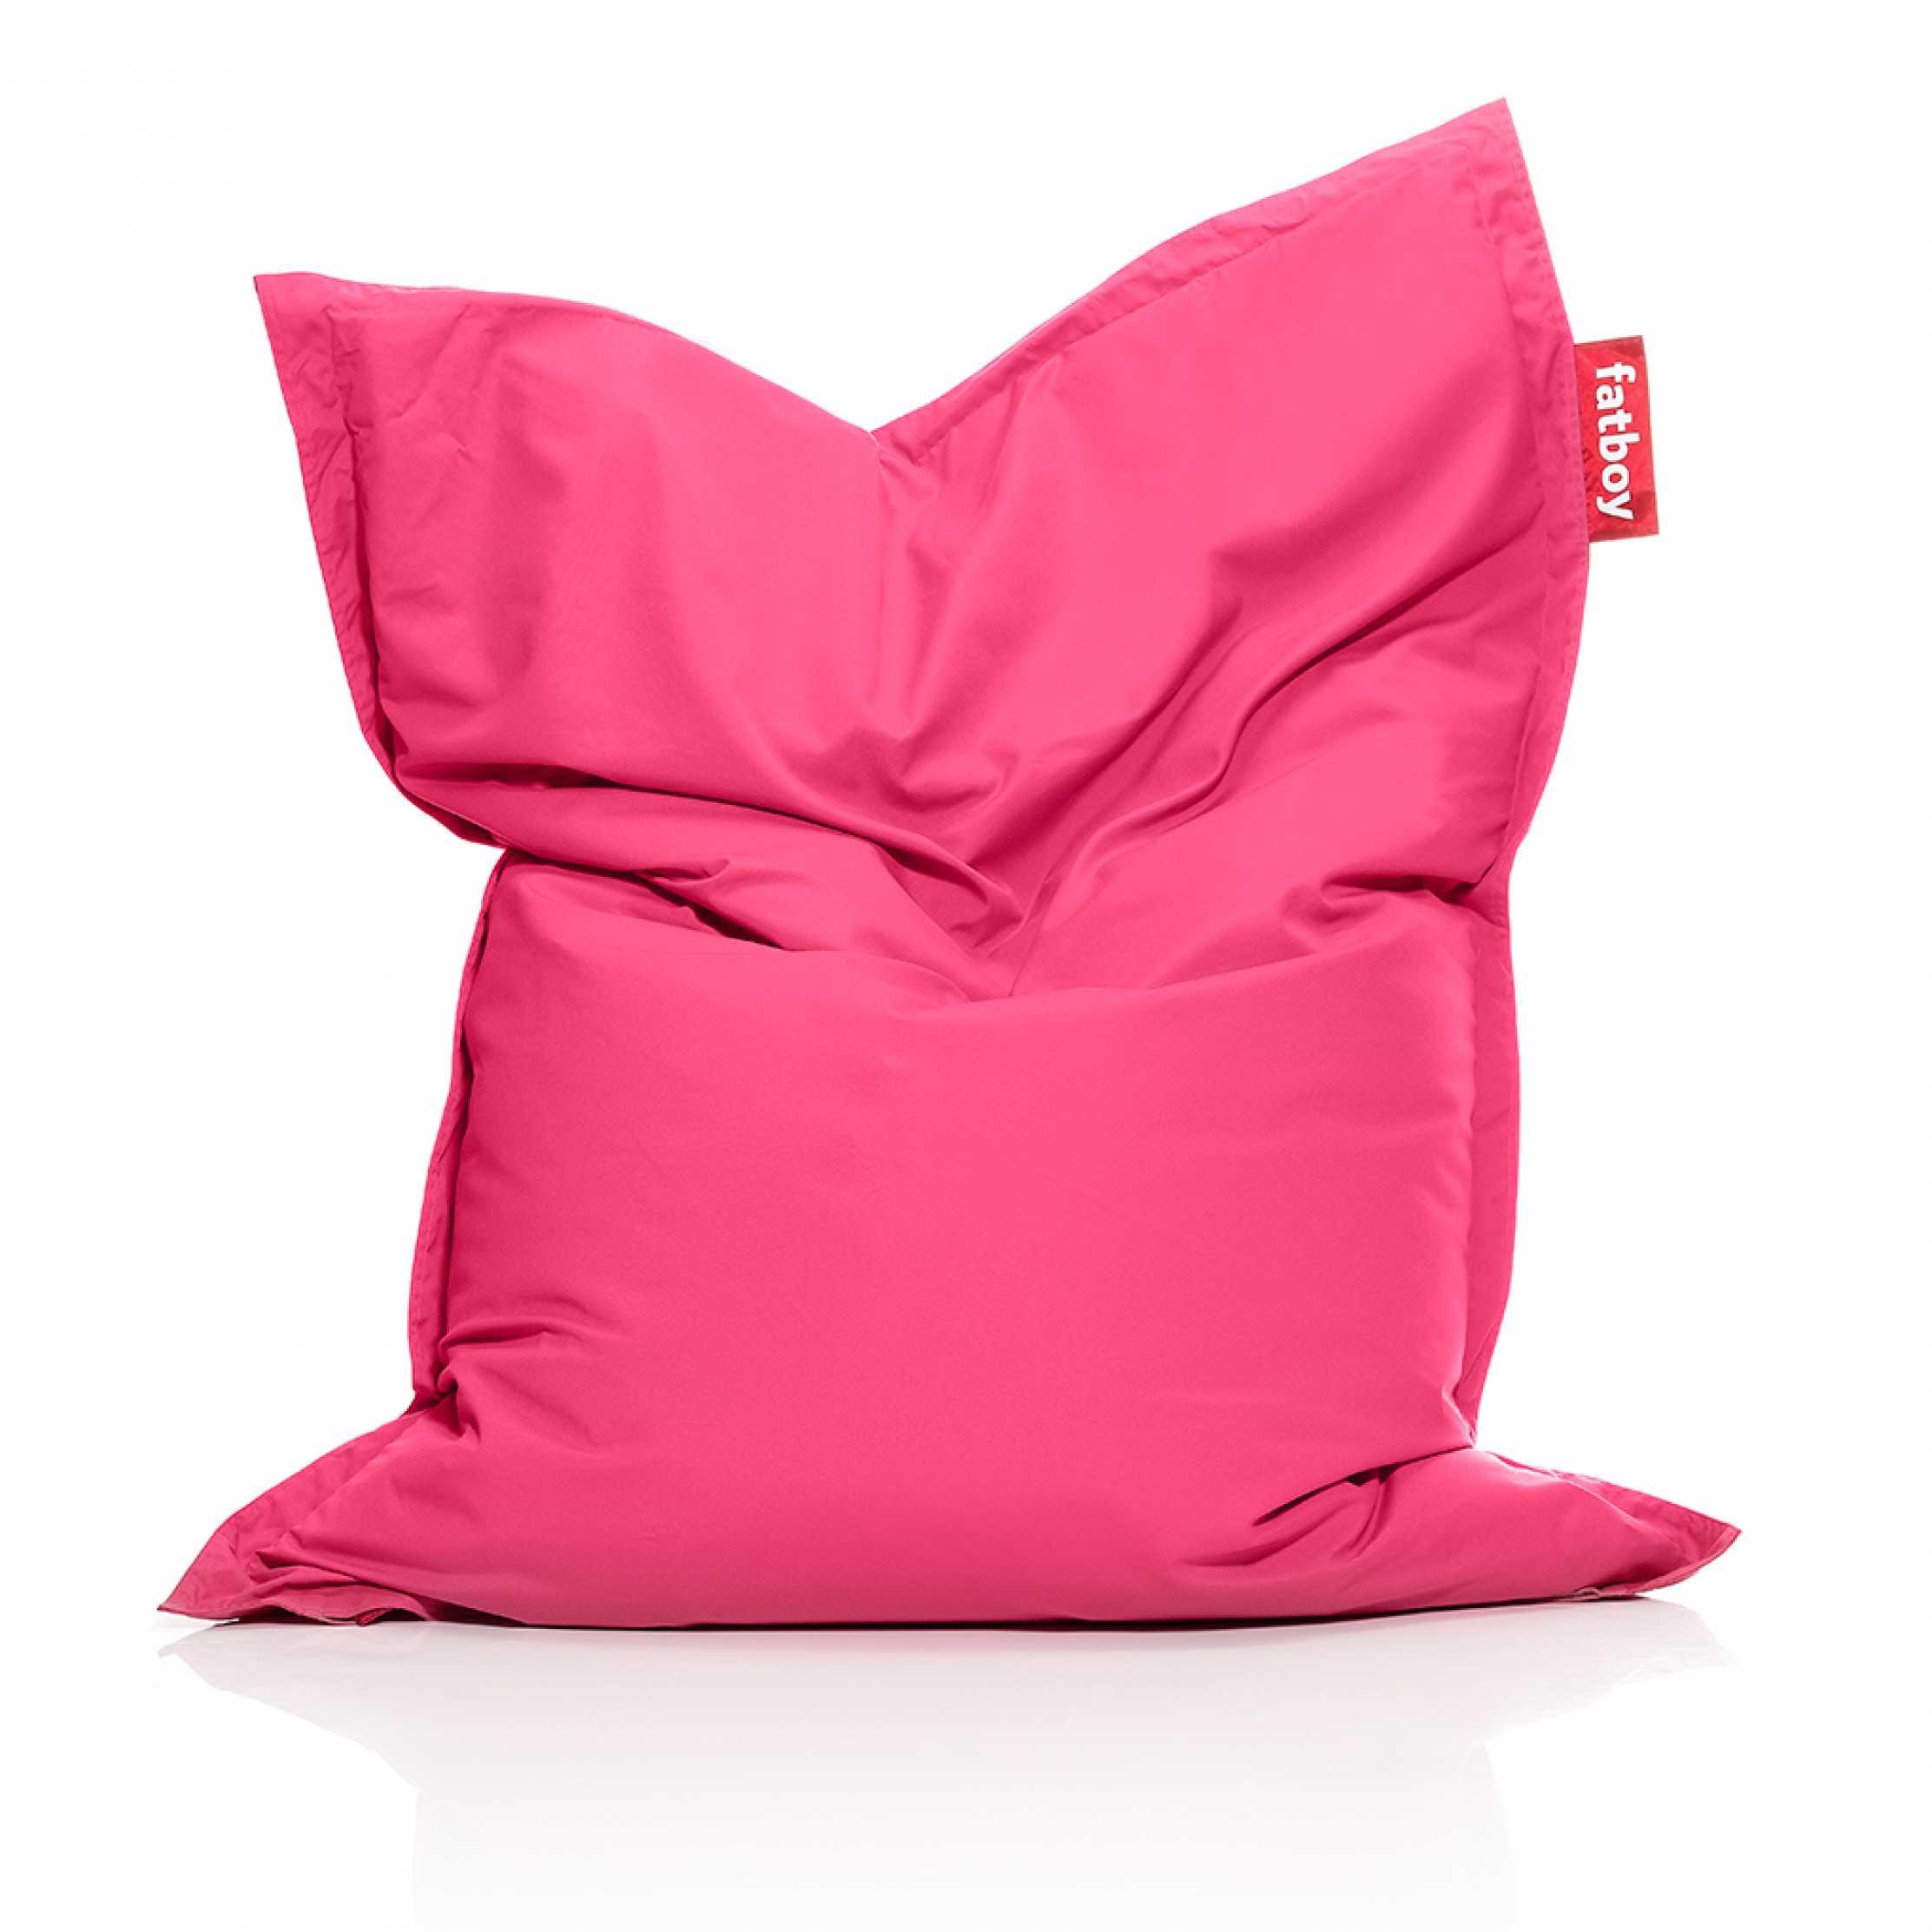 ... Fat Boy bean bag outdoor pink ...  sc 1 st  Finest Bed Linen u0026 Interiors & Fat Boy Bean bag - Outdoor | Home u0026 Yacht Linen and Interiors